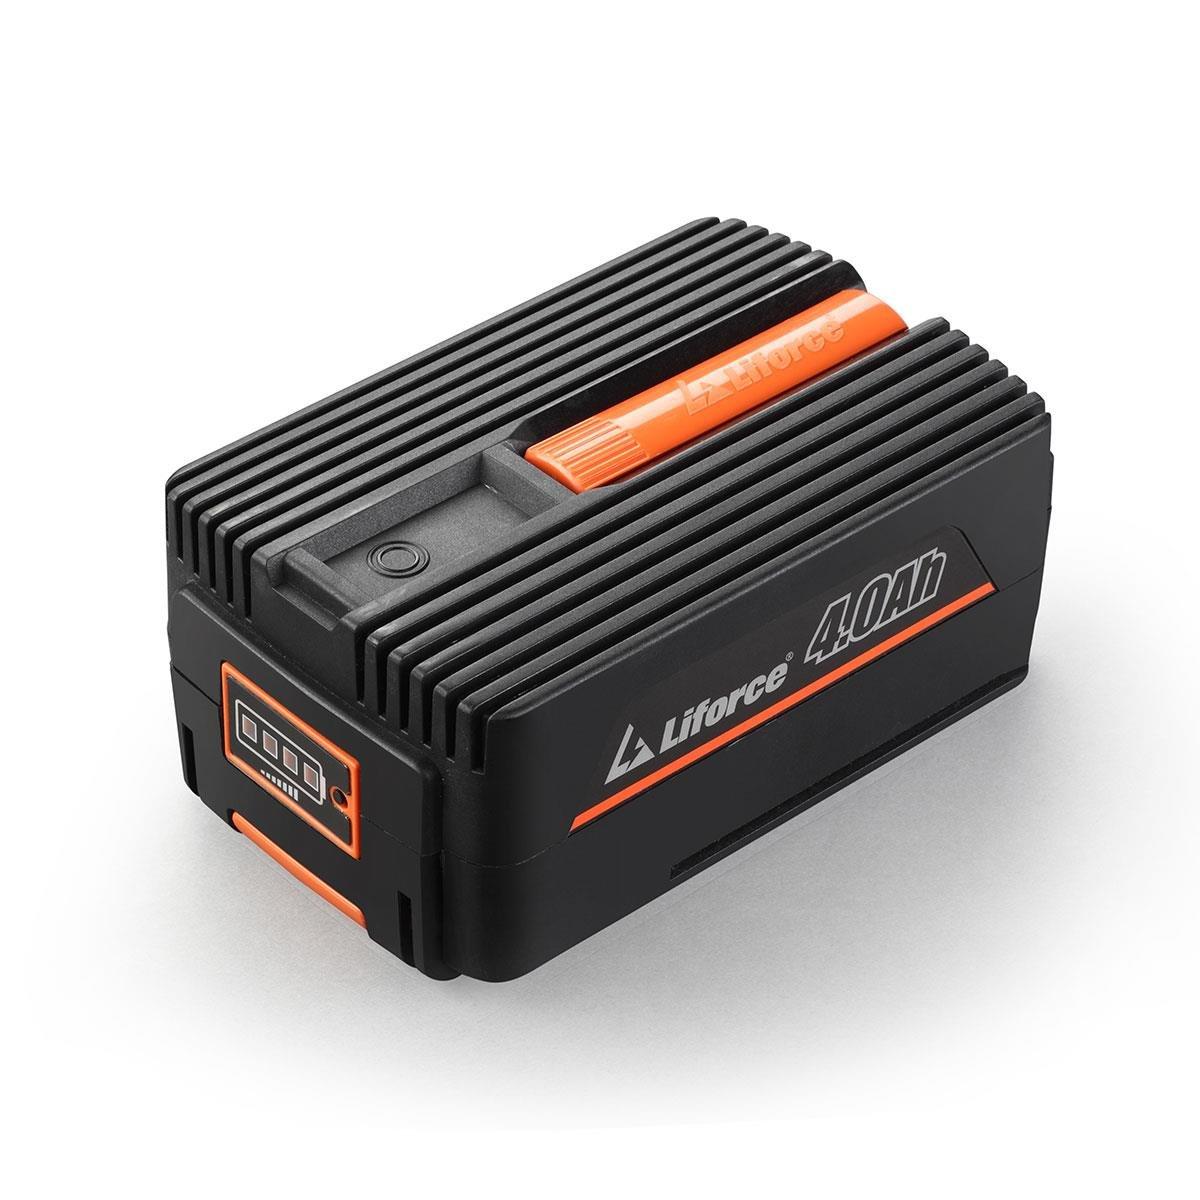 Fuxtec 40V Akku Rasenmäher Set E137C 37cm Lithium Batterie von Samsung mit one Battery fits alle Geräte – ETM…